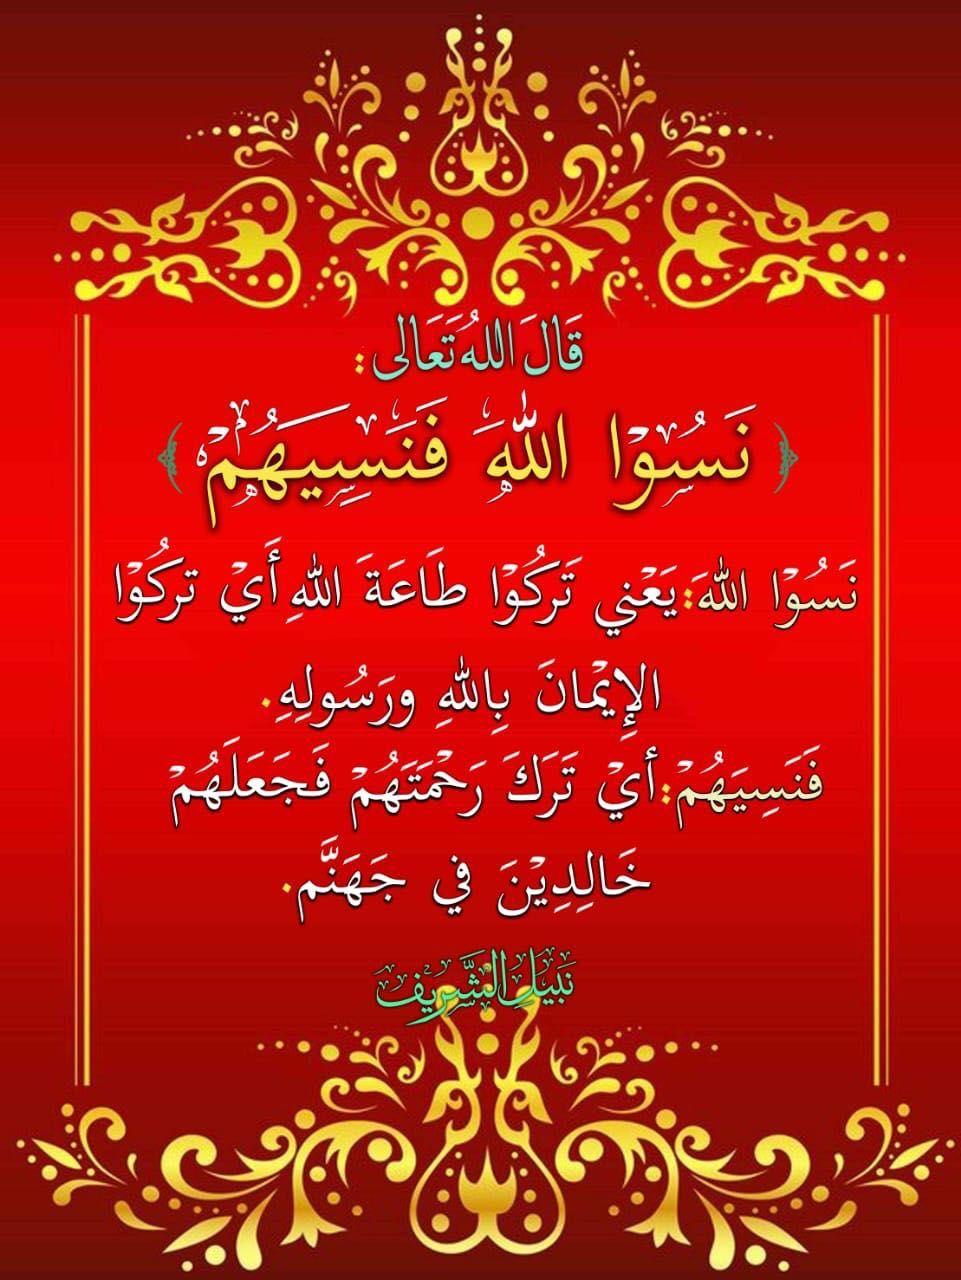 Pin By Alsunniy On معلومات إسلامية Arabic Calligraphy Calligraphy